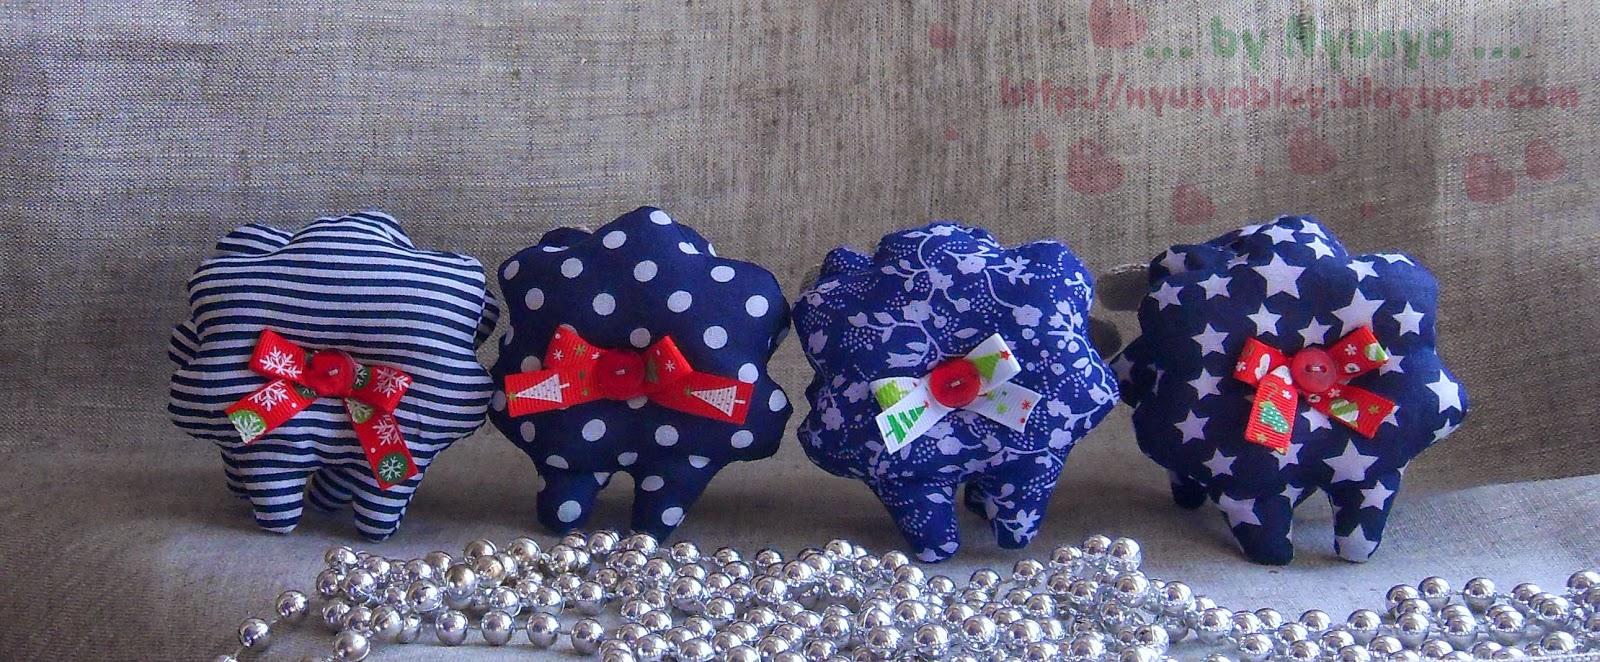 синие овечки на Новый год